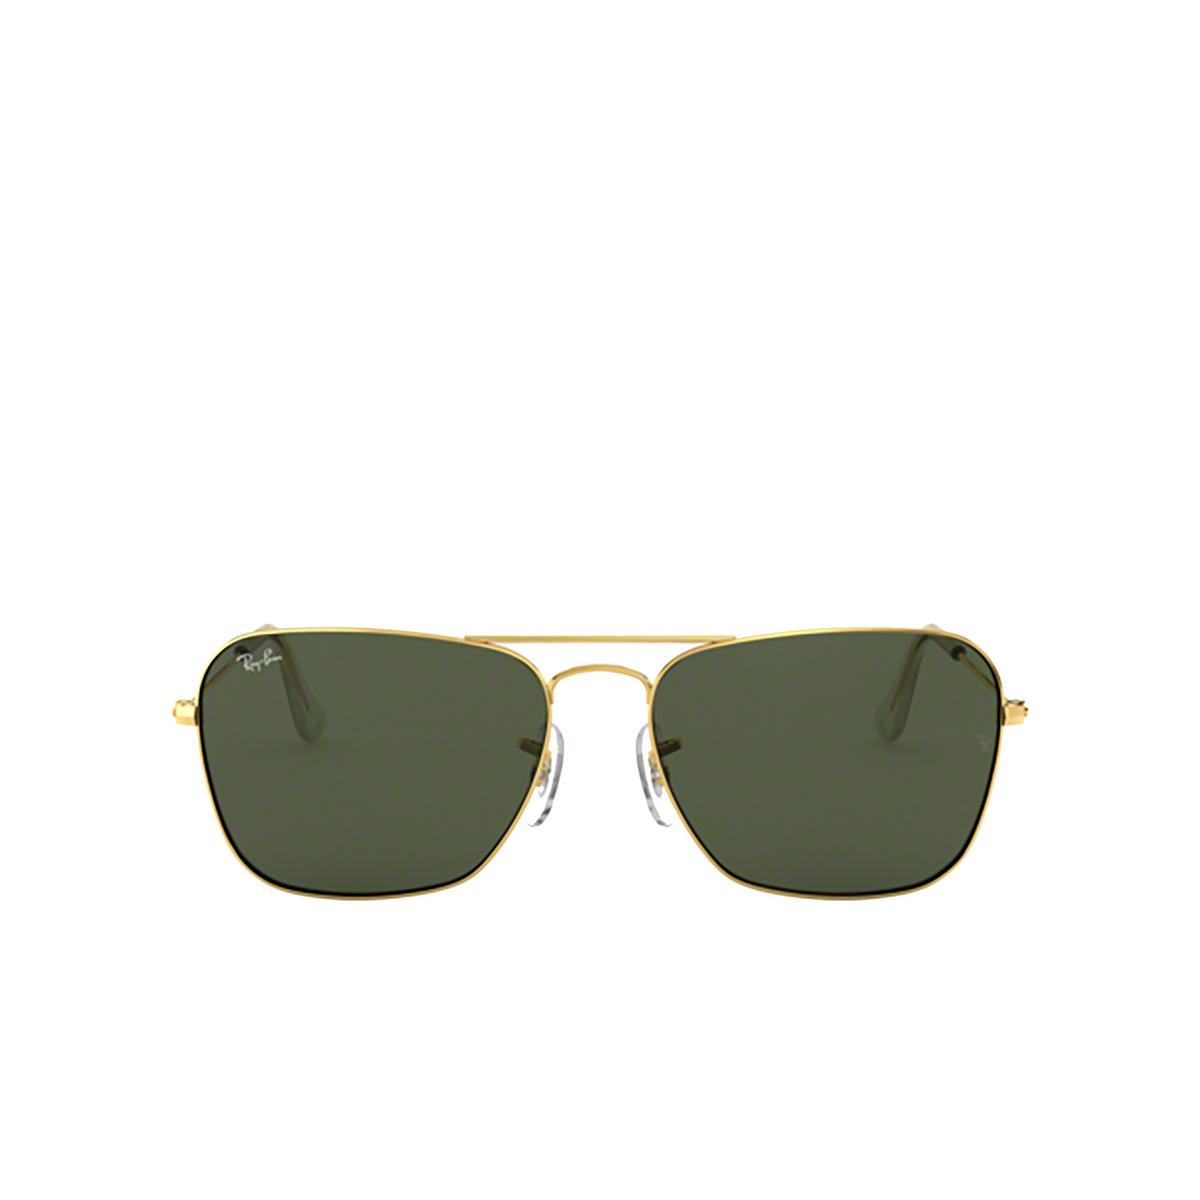 Ray-Ban® Square Sunglasses: Caravan RB3136 color Arista 001 - 1/3.